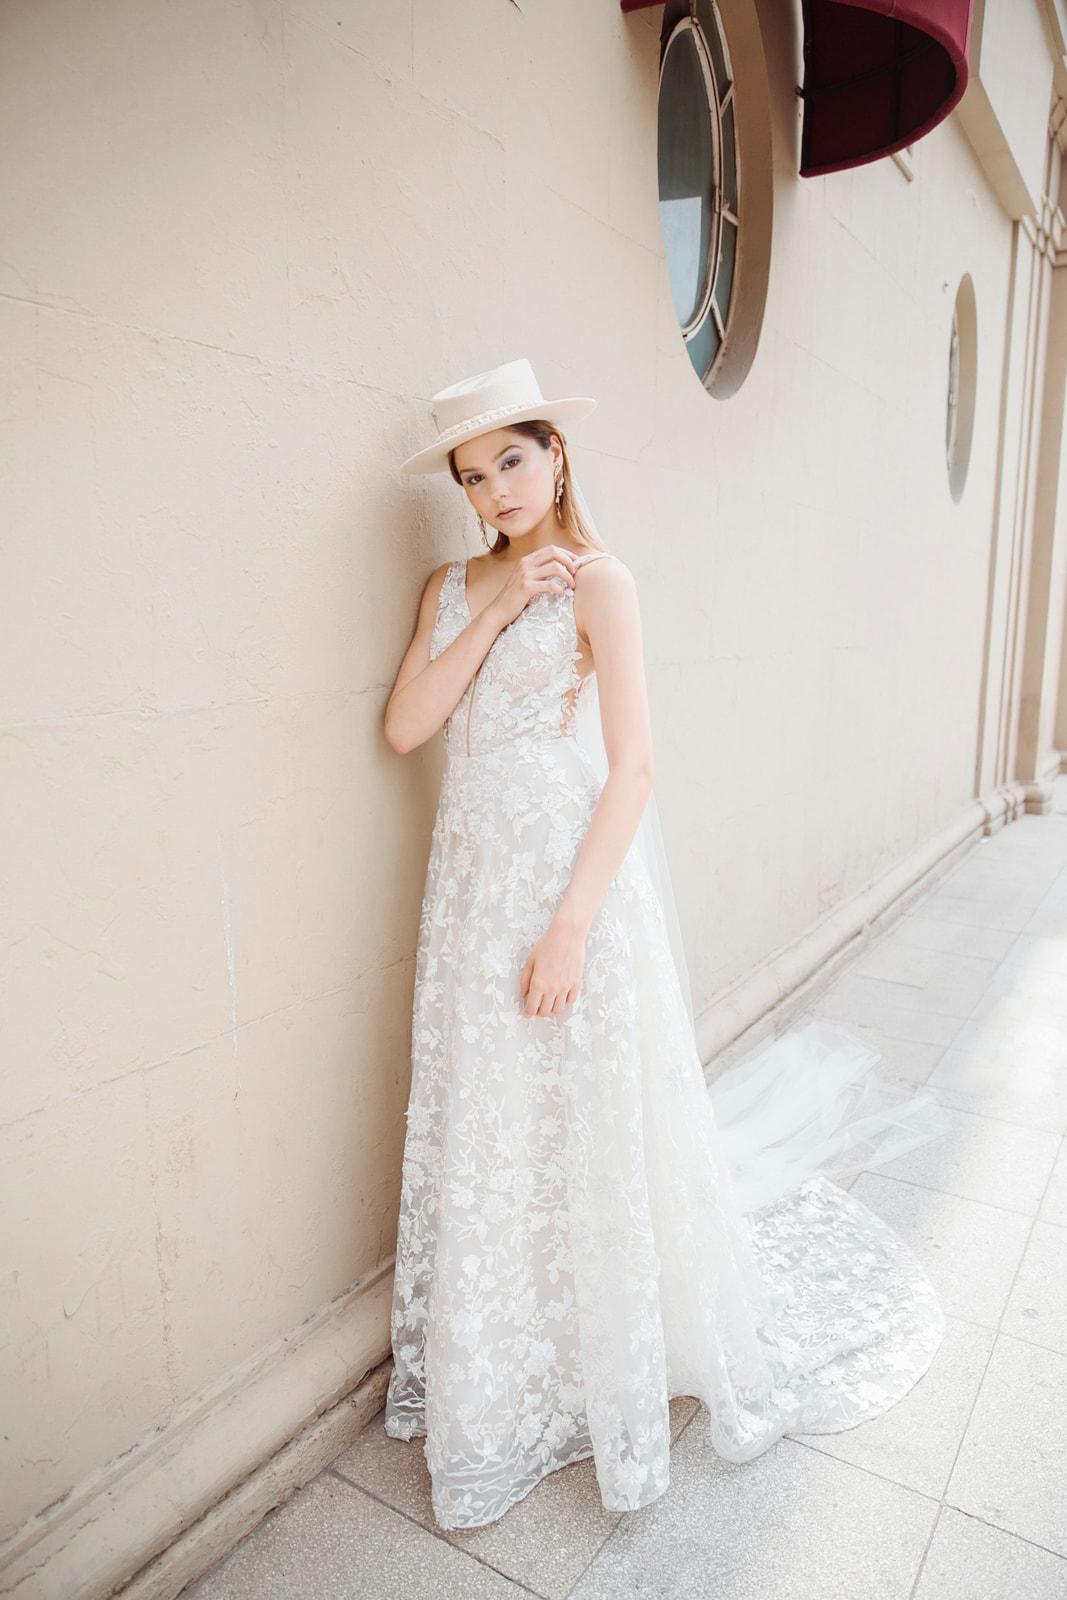 Carlotta_dress_(41_of_58).jpg